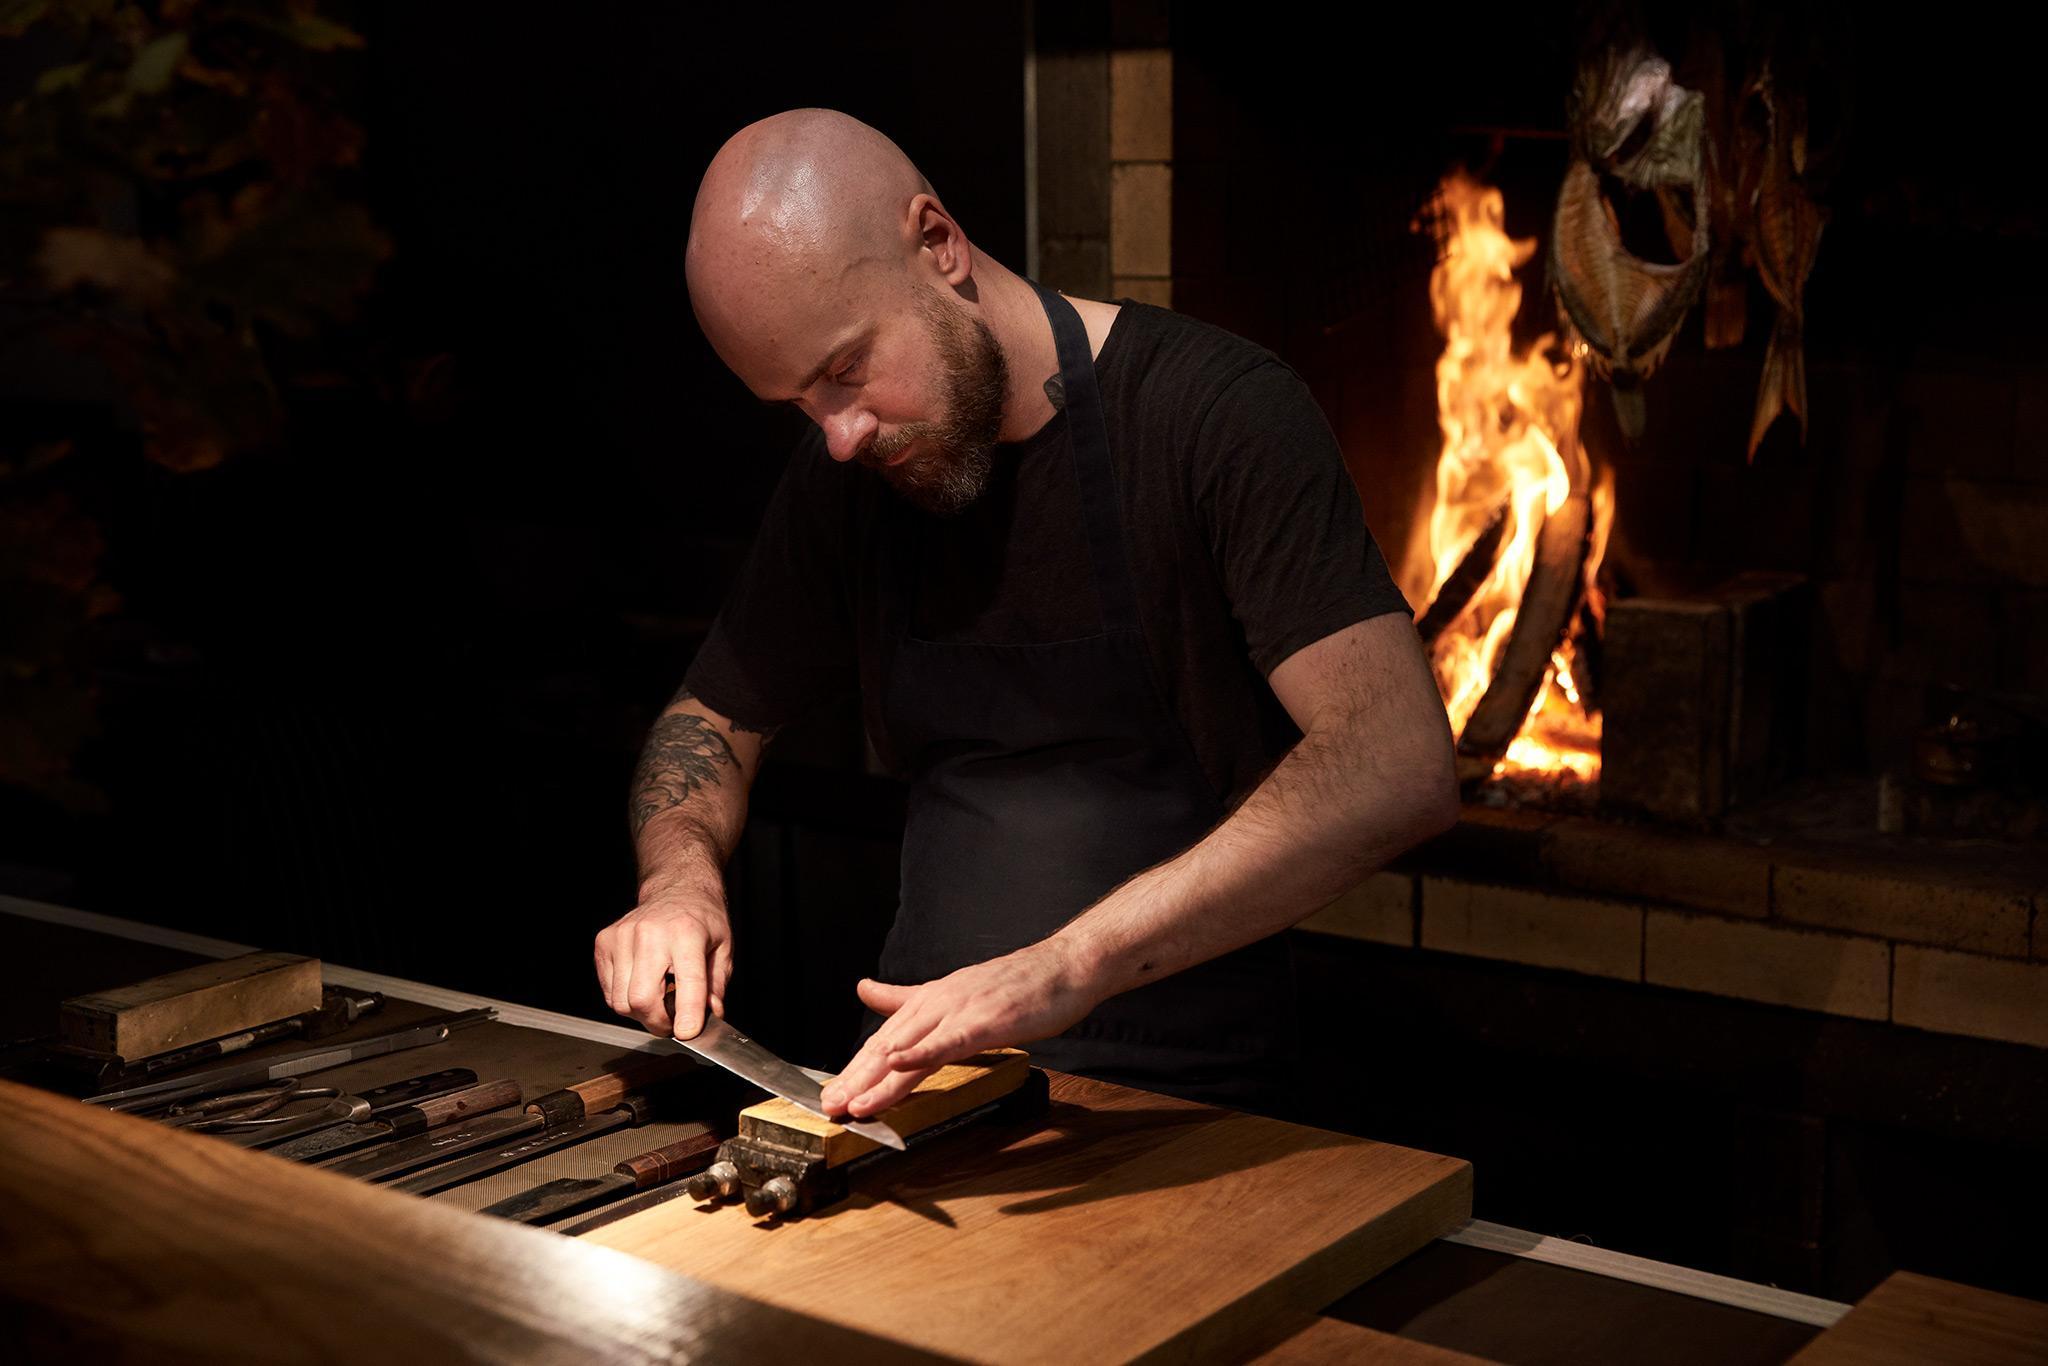 Chef Verner at Pasture